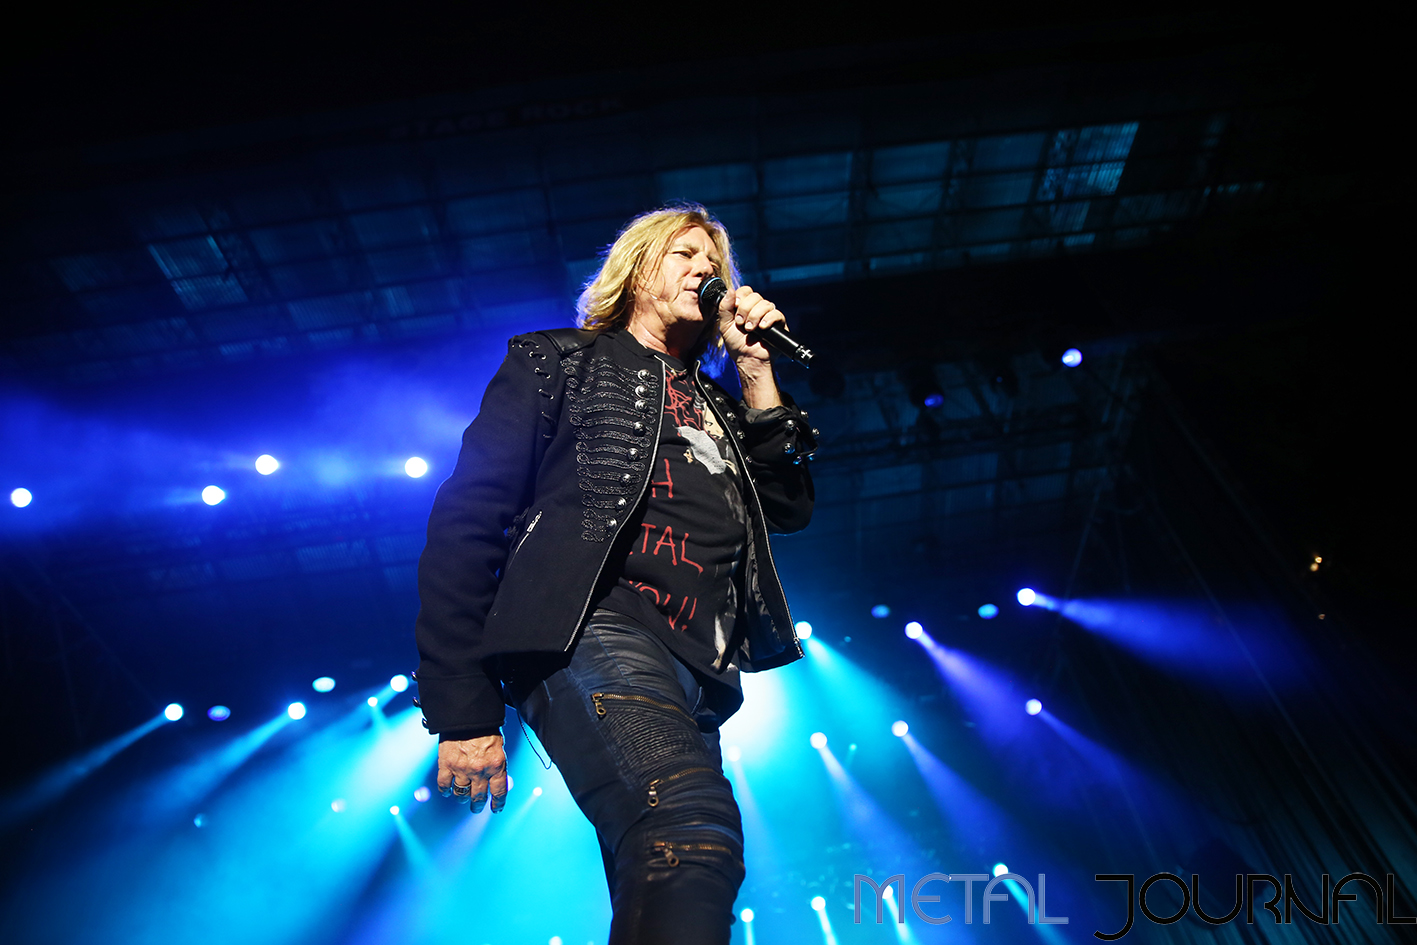 def leppard - metal journal rock fest barcelona 2019 pic 2